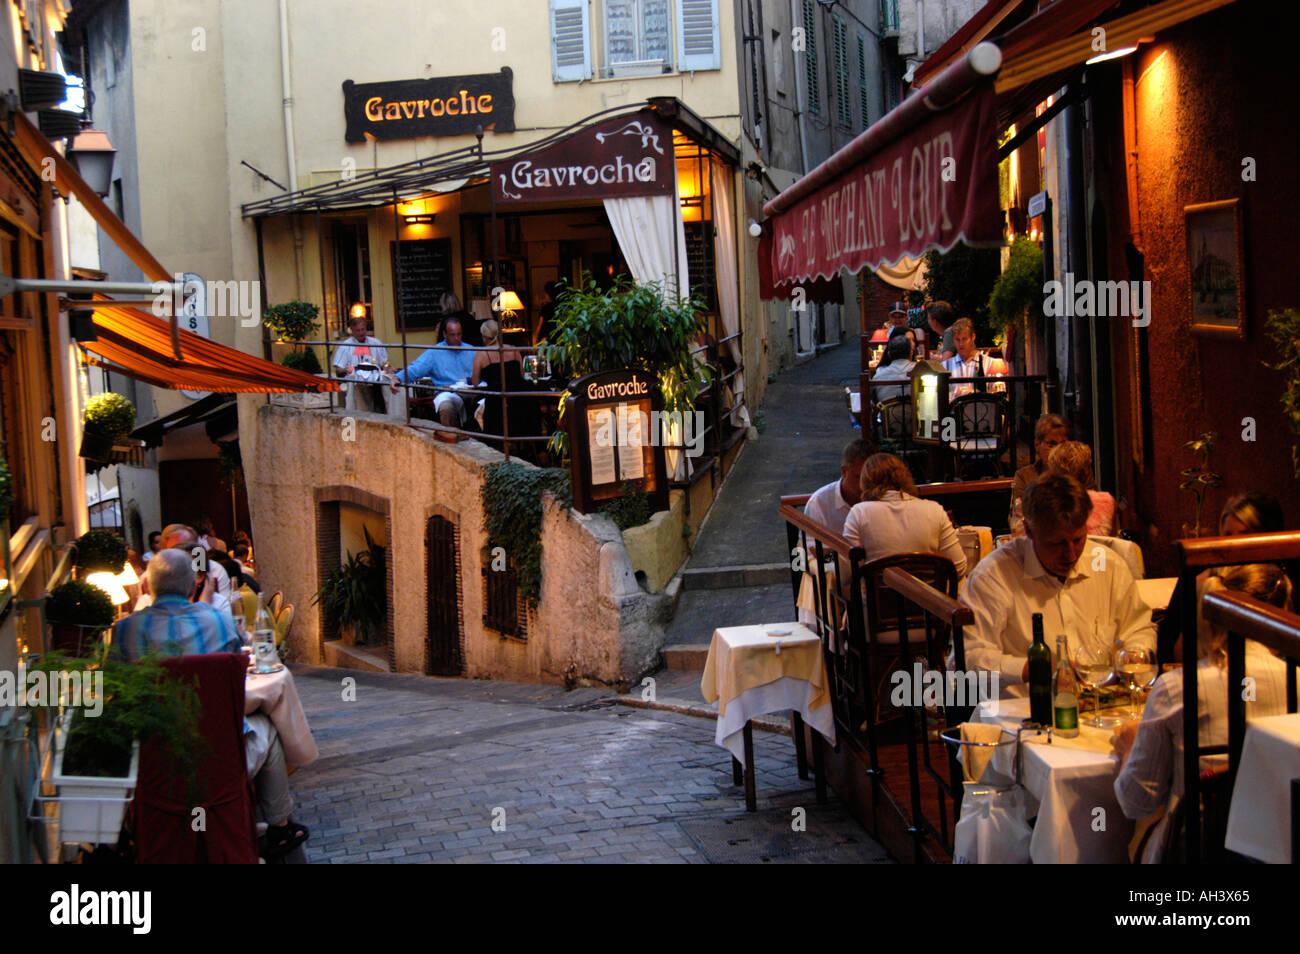 French Restaurants France Menu